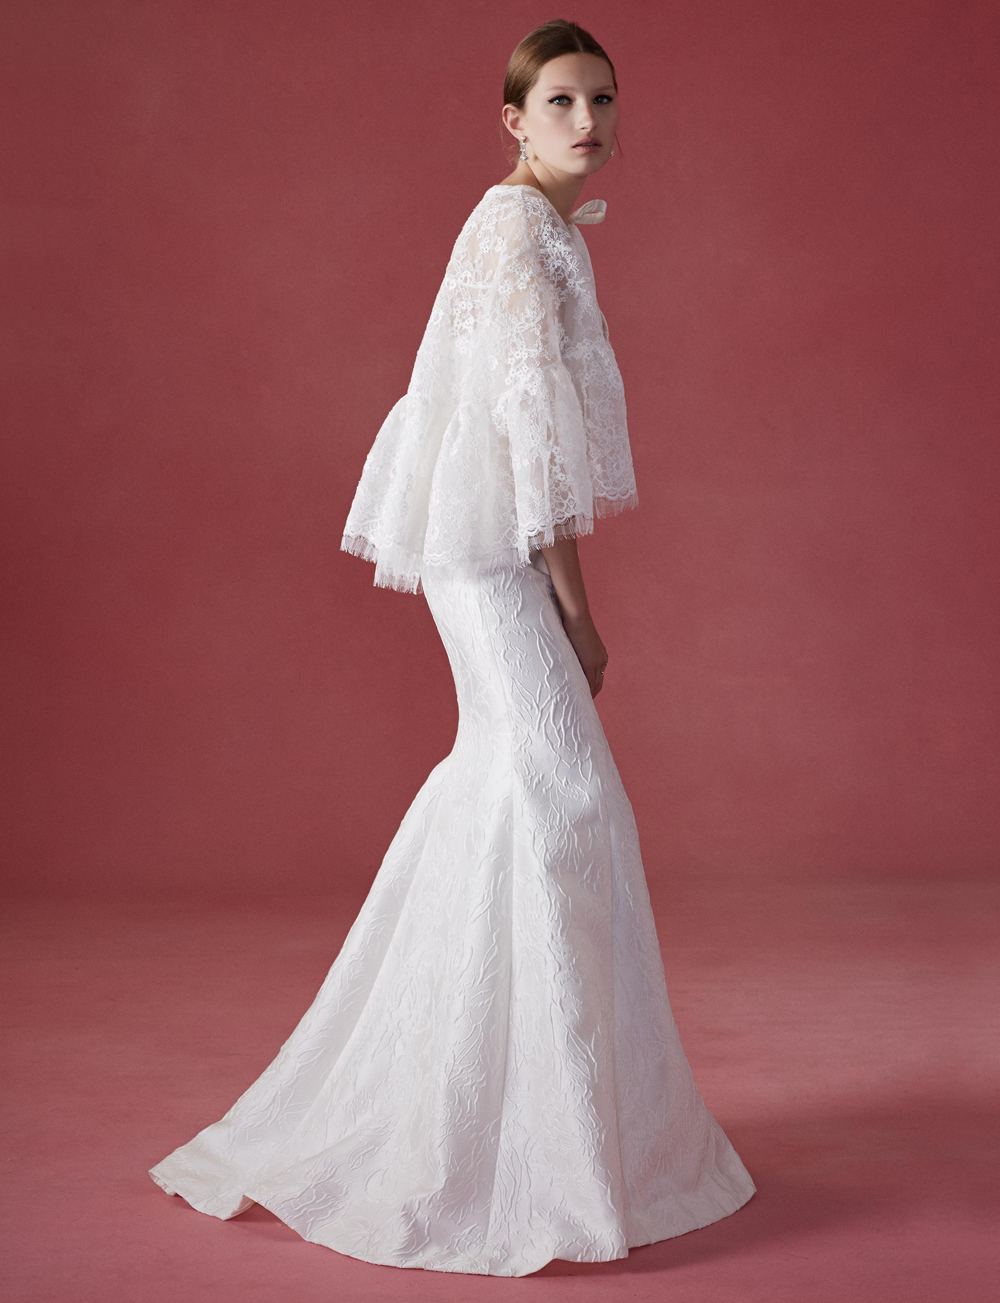 see oscar de la renta 39 s fall 2016 wedding dress collection